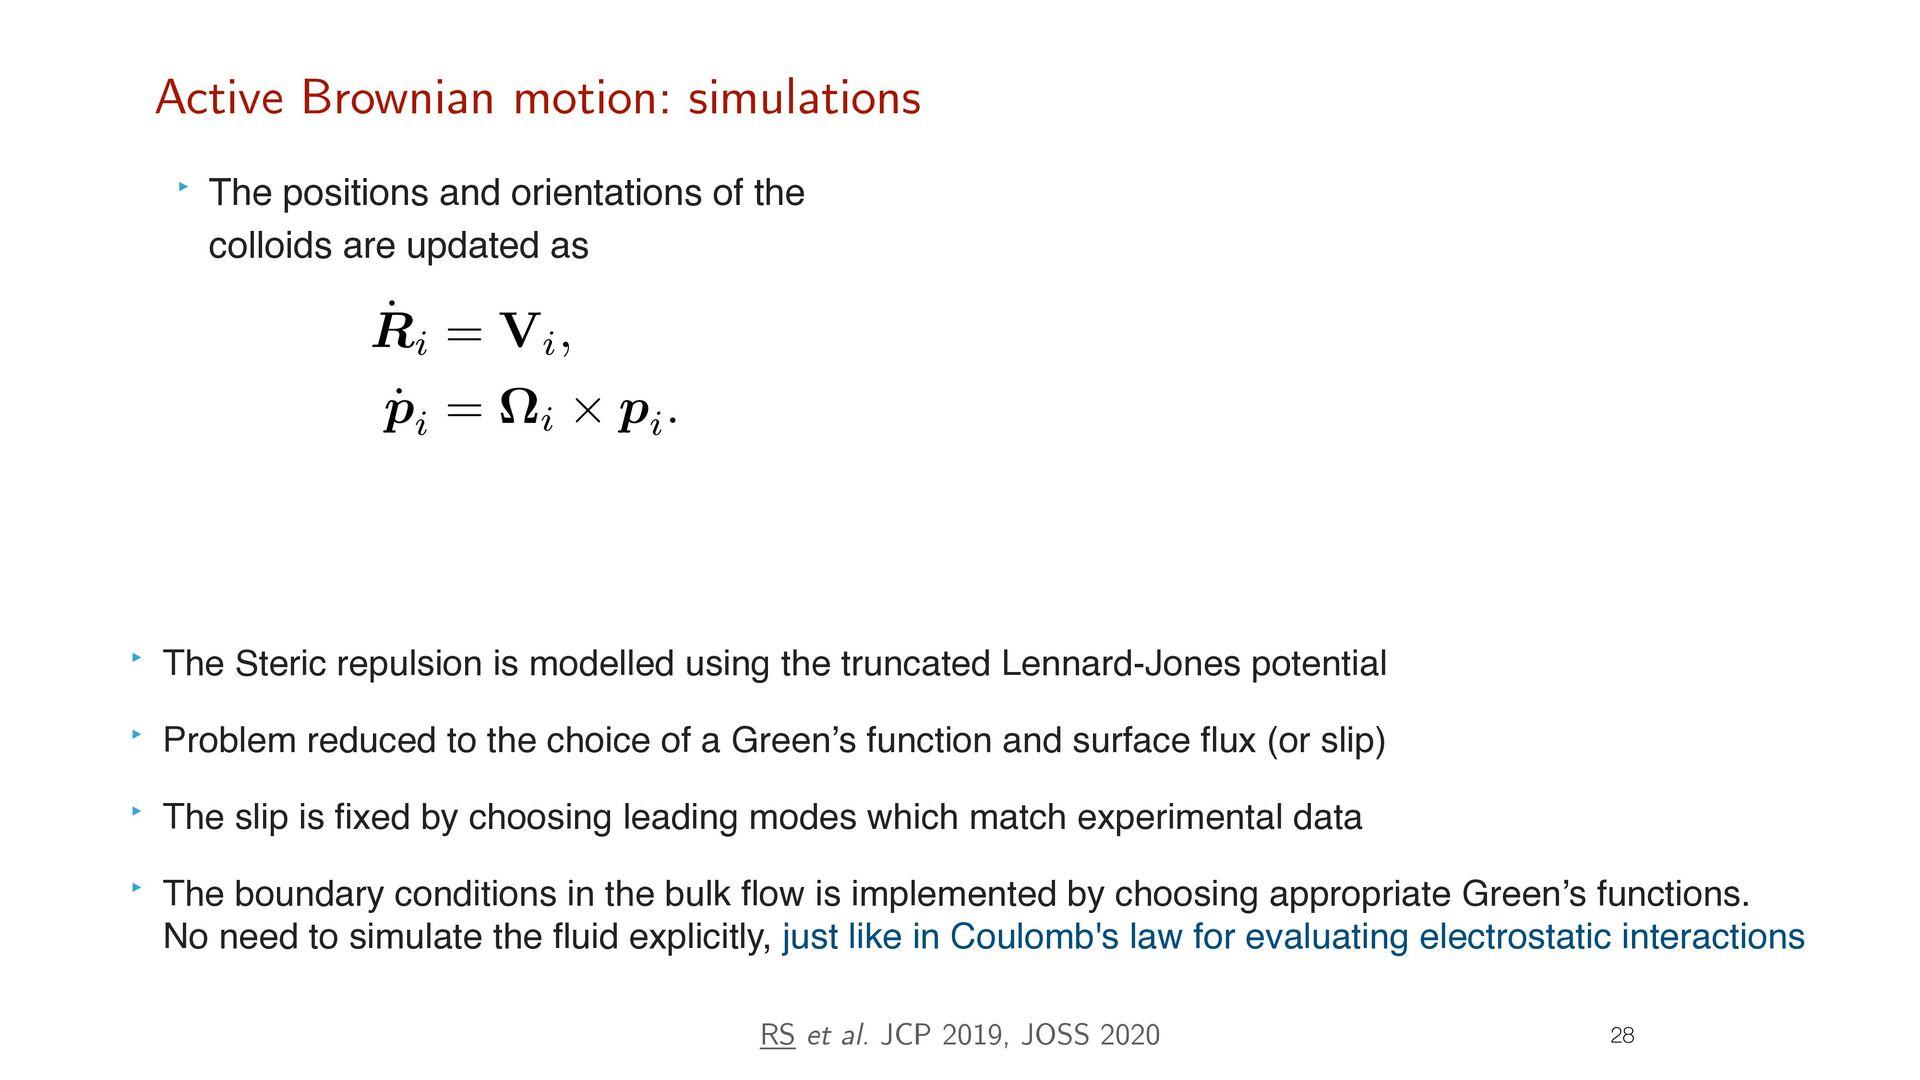 26 Active Brownian motion: theory FH i + FP i +...